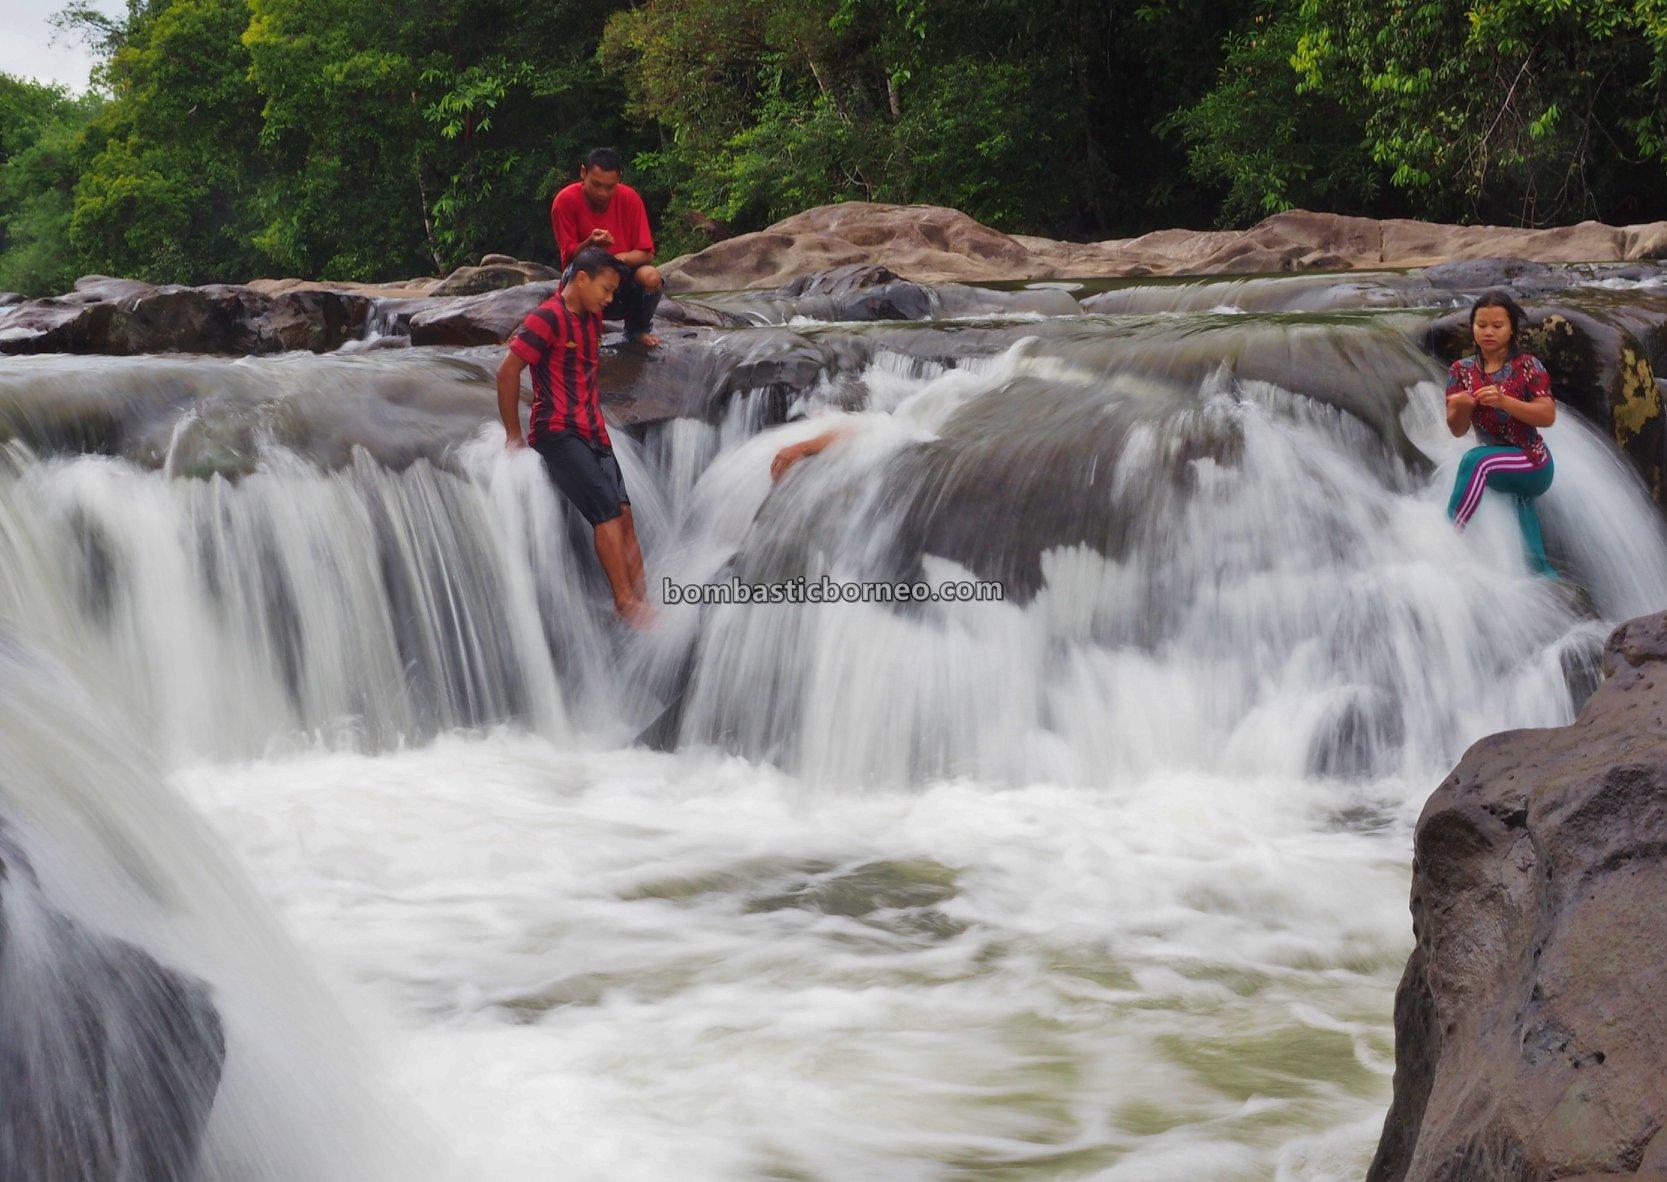 Air Terjun, Waterfall, Dusun Simpang Empat, adventure, nature, outdoor, exploration, Desa Bengkawan, Wisata Alam, Tourism, travel guide, Trans Borneo, backpackers, 跨境婆罗洲游踪, 印尼西加里曼丹, 孟加映瀑布,